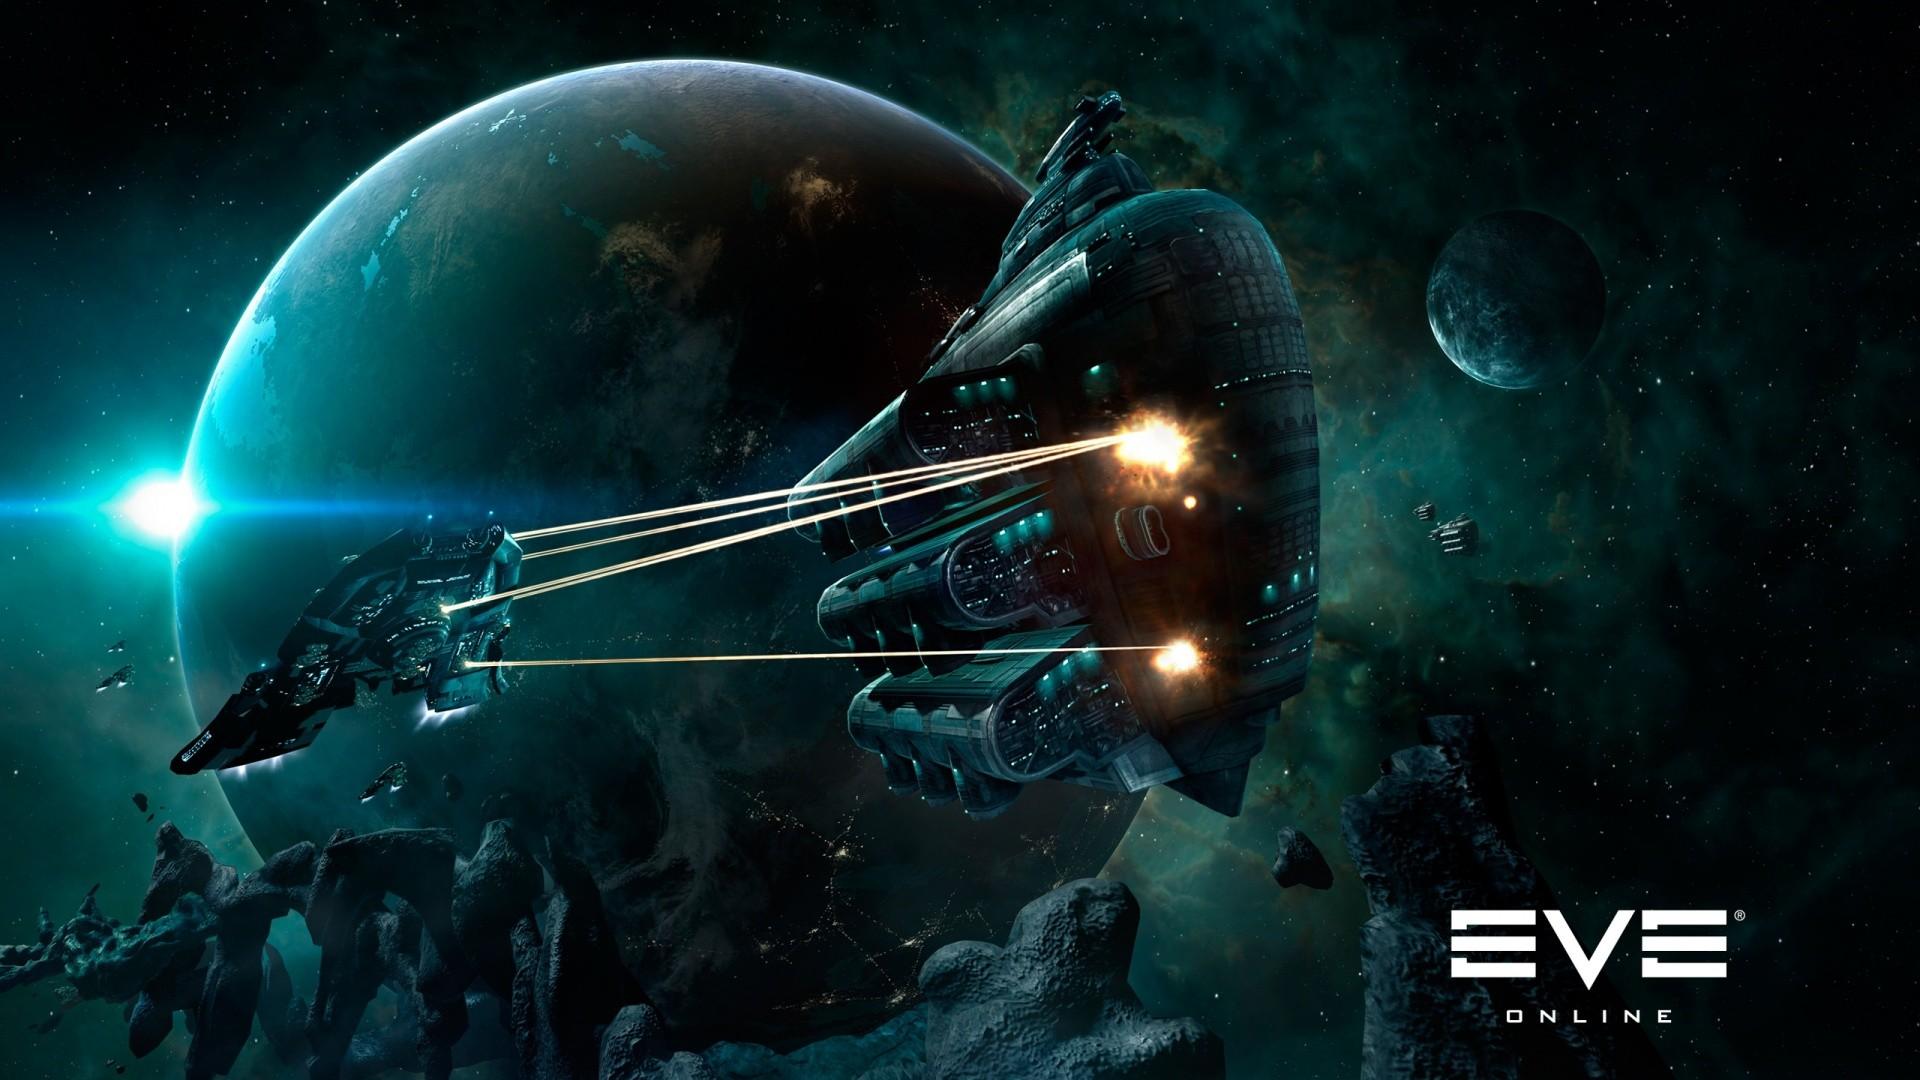 EVE Online Full HD Wallpaper